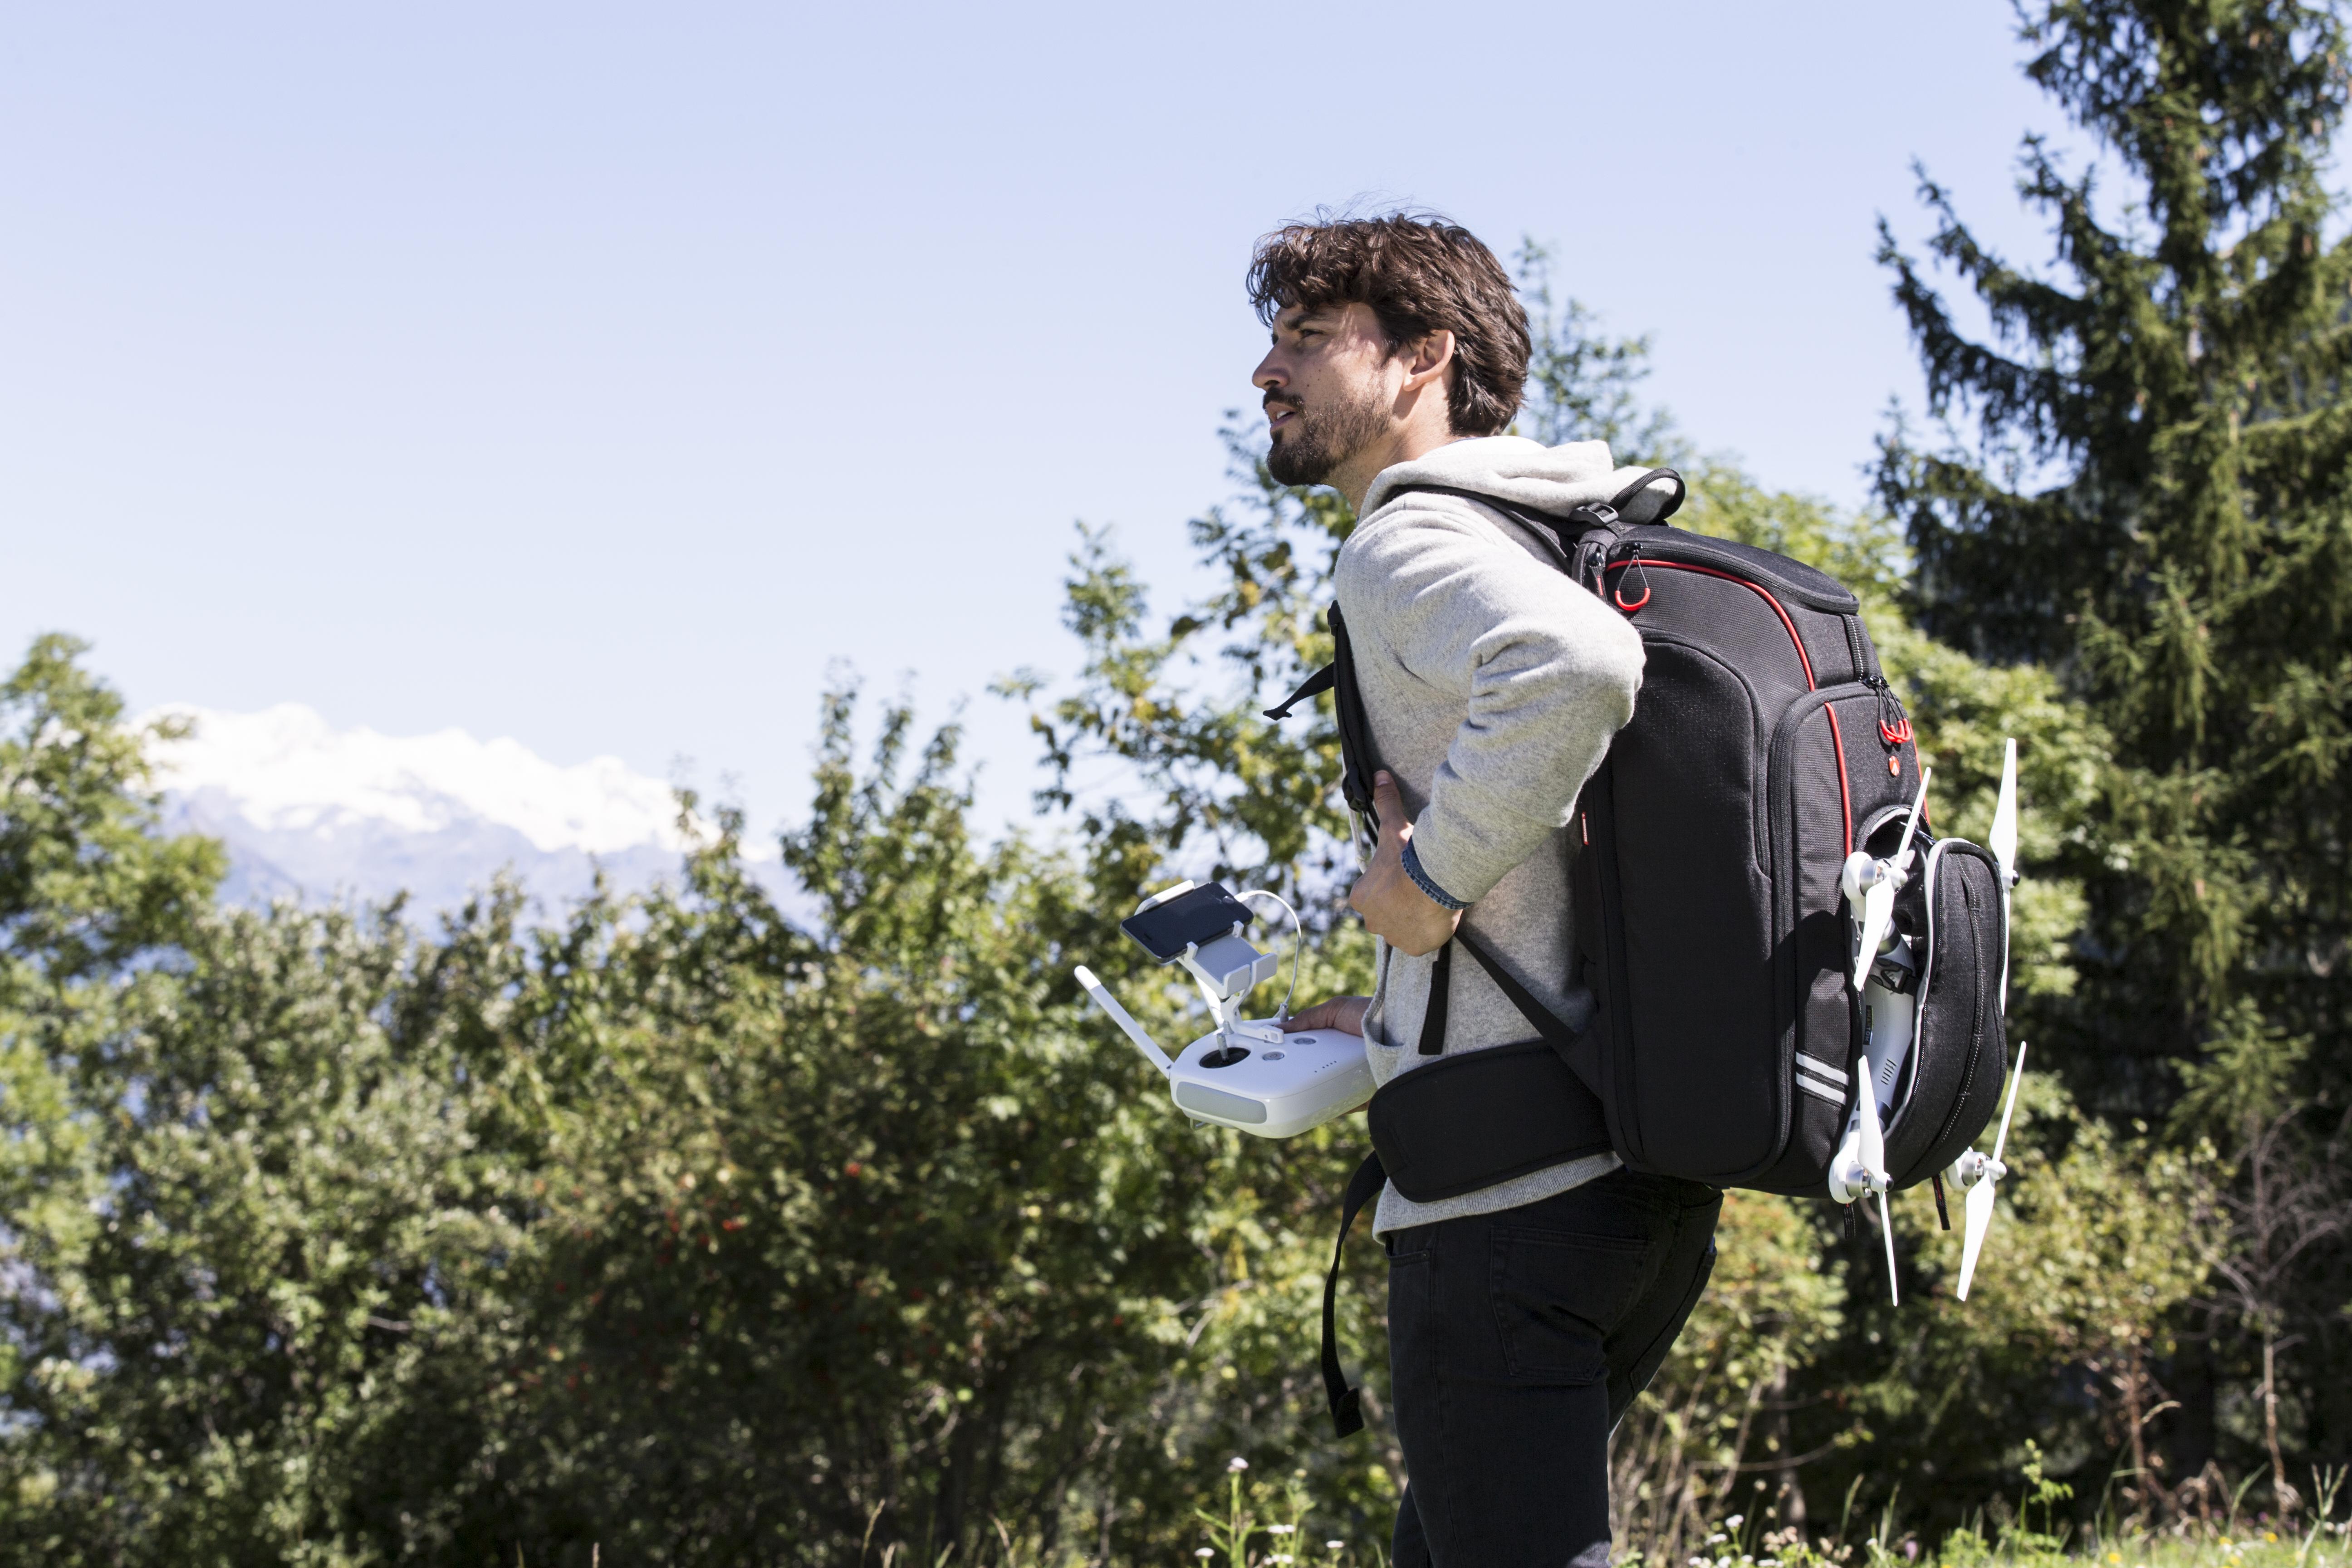 293e27d7643f Купить Manfrotto BP-D1 Drone Backpack D1 Рюкзак для DJI Phantom 3/4 ...